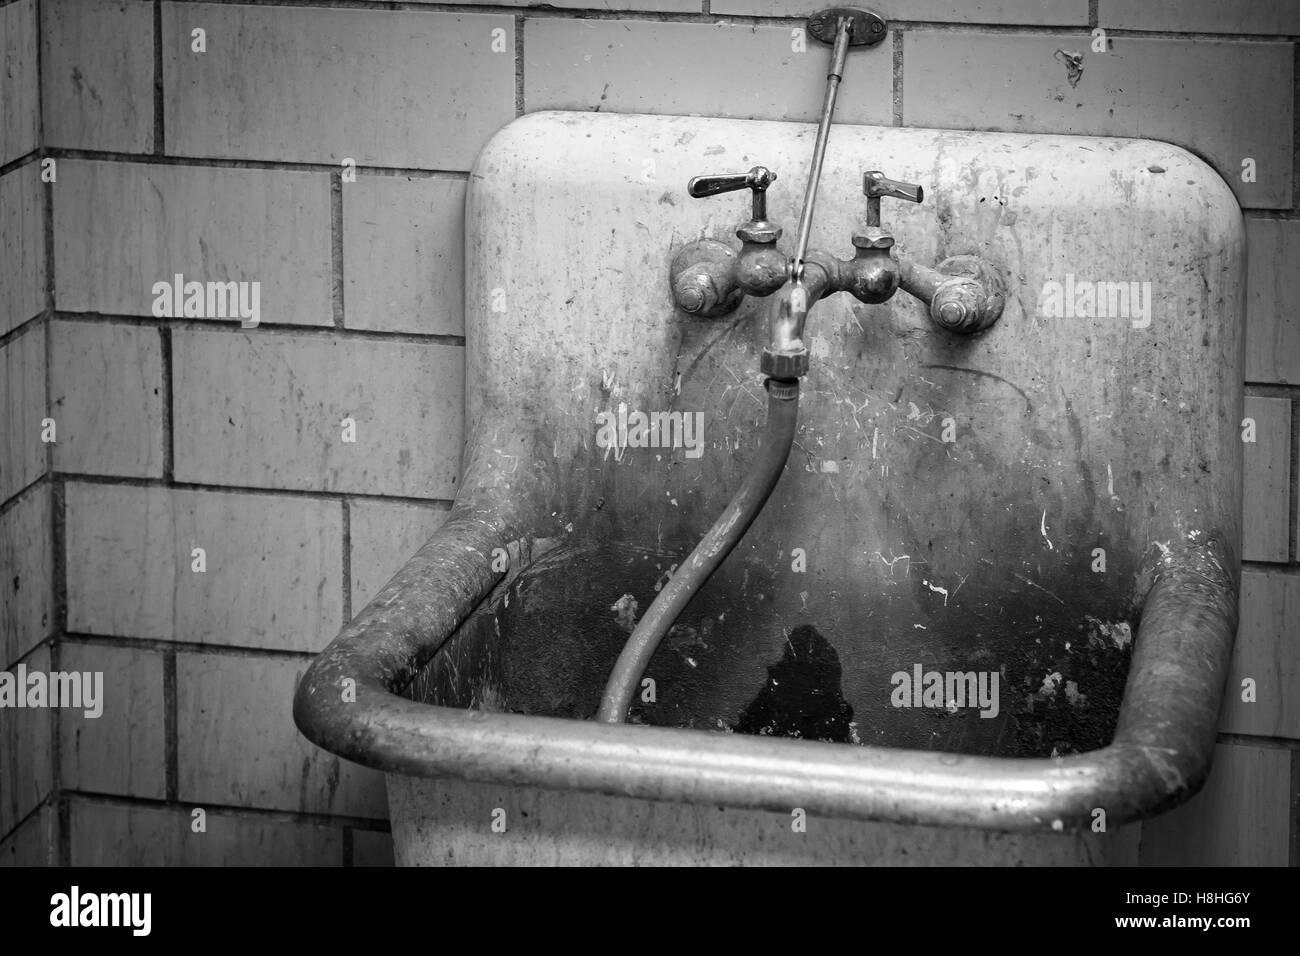 Laundry Room Sink Stockfotos & Laundry Room Sink Bilder - Alamy